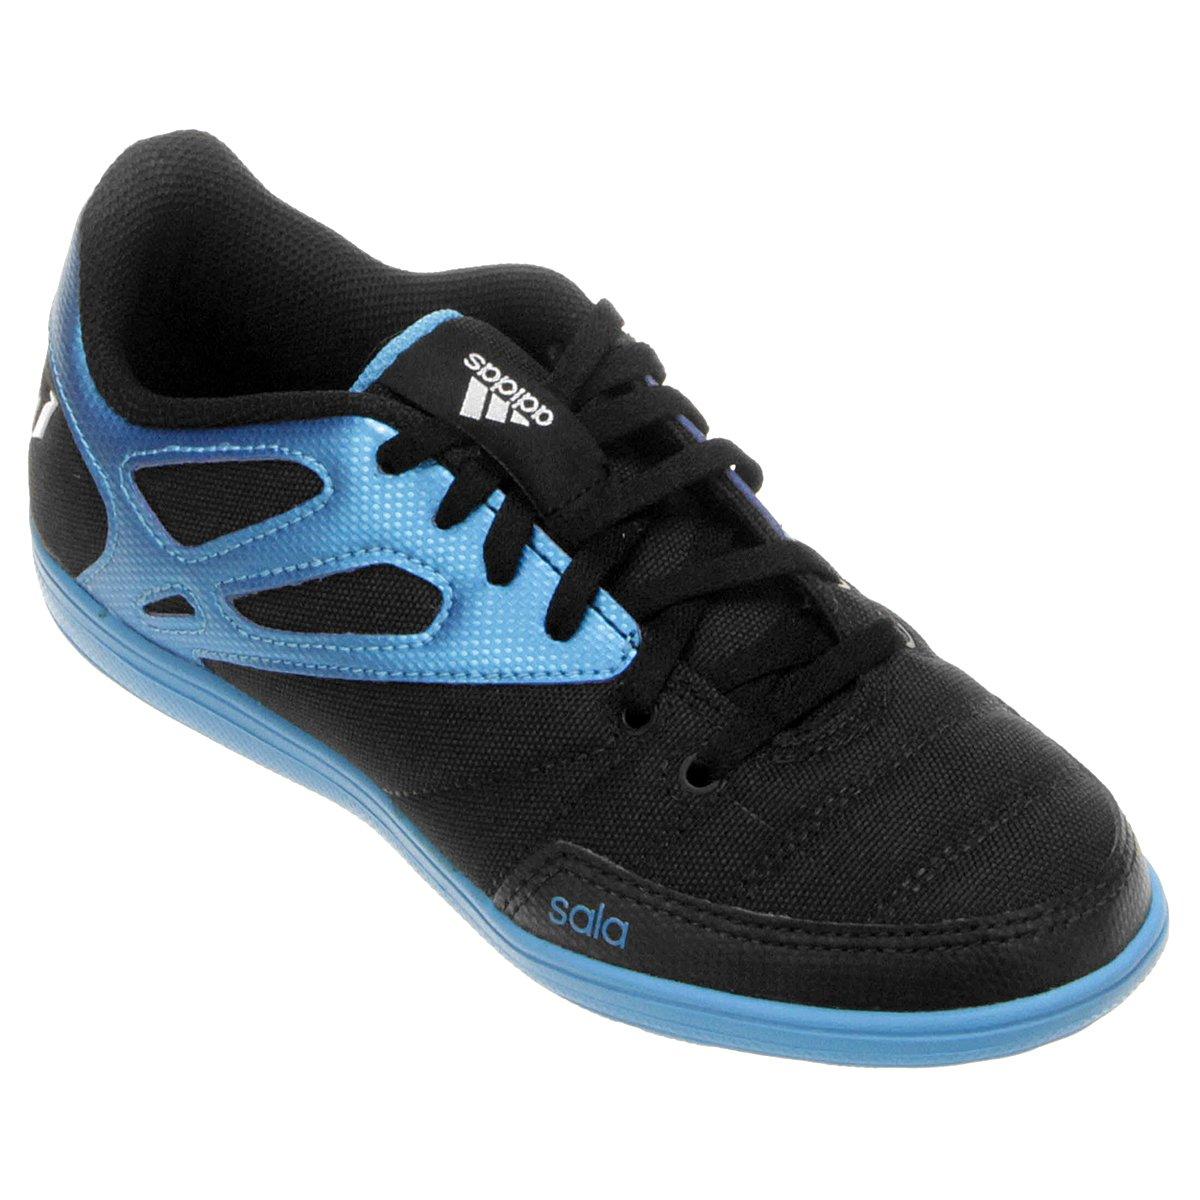 Chuteira Adidas Messi 15.4 ST Futsal Juvenil - Compre Agora  4d75b016abcdf